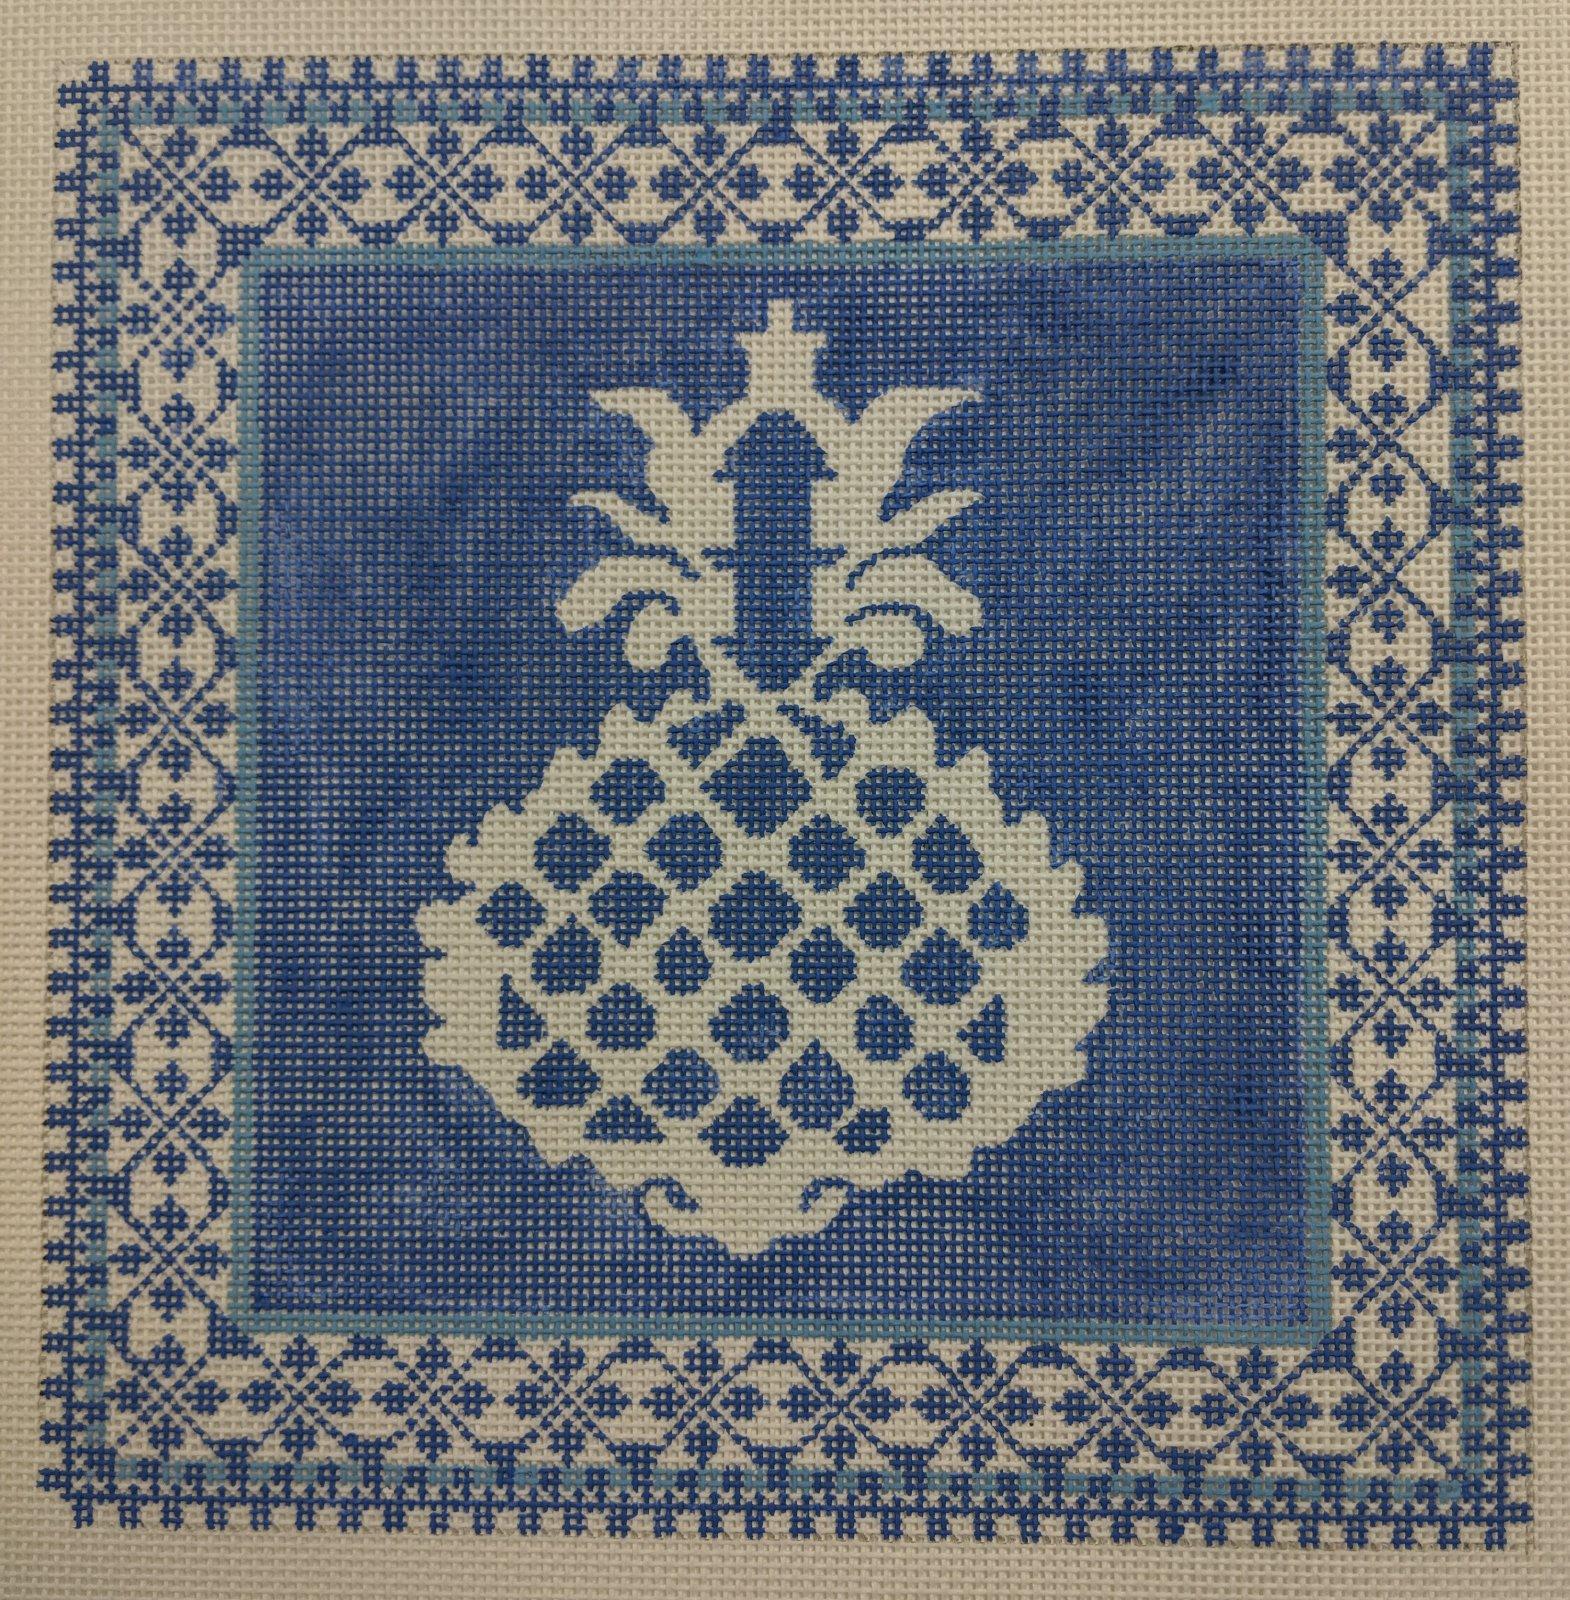 Blue Pineapple / Border, 13ct., 9.75 x 9.75